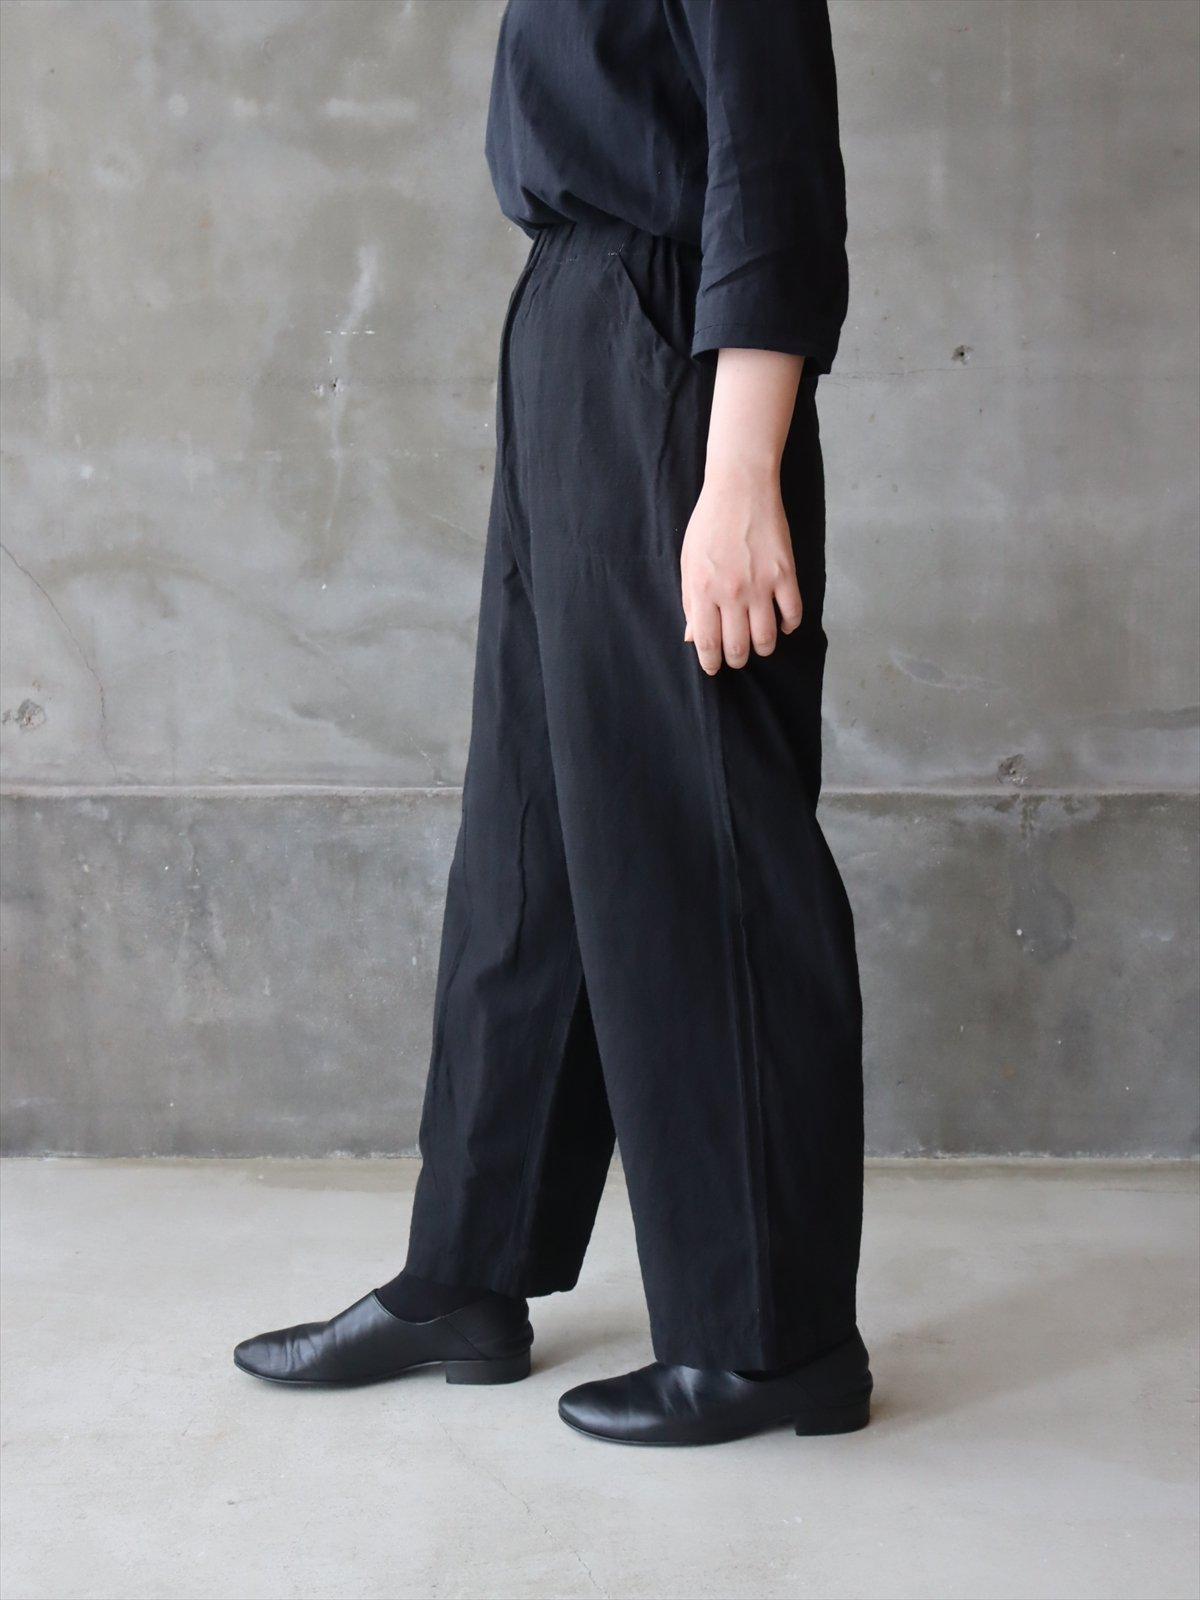 YAMMA 会津木綿ダボダボパンツ 黒